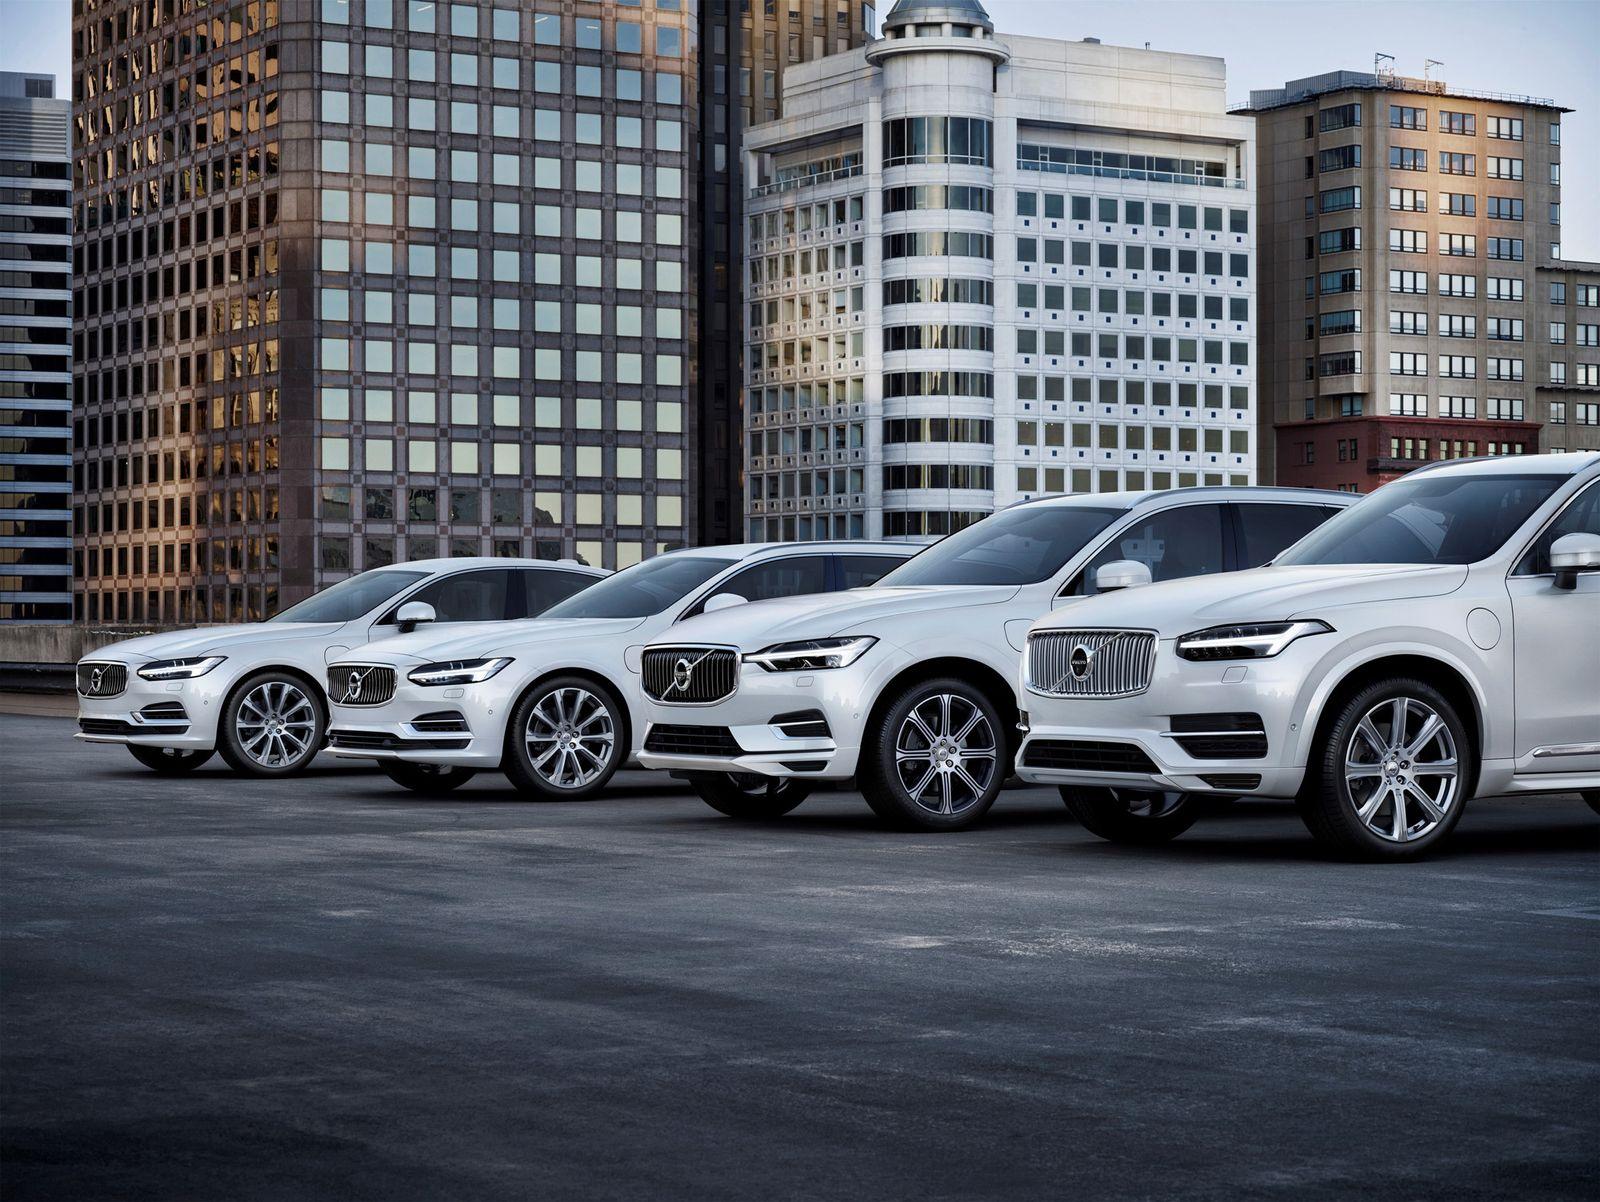 Volvo / Pressemeldung